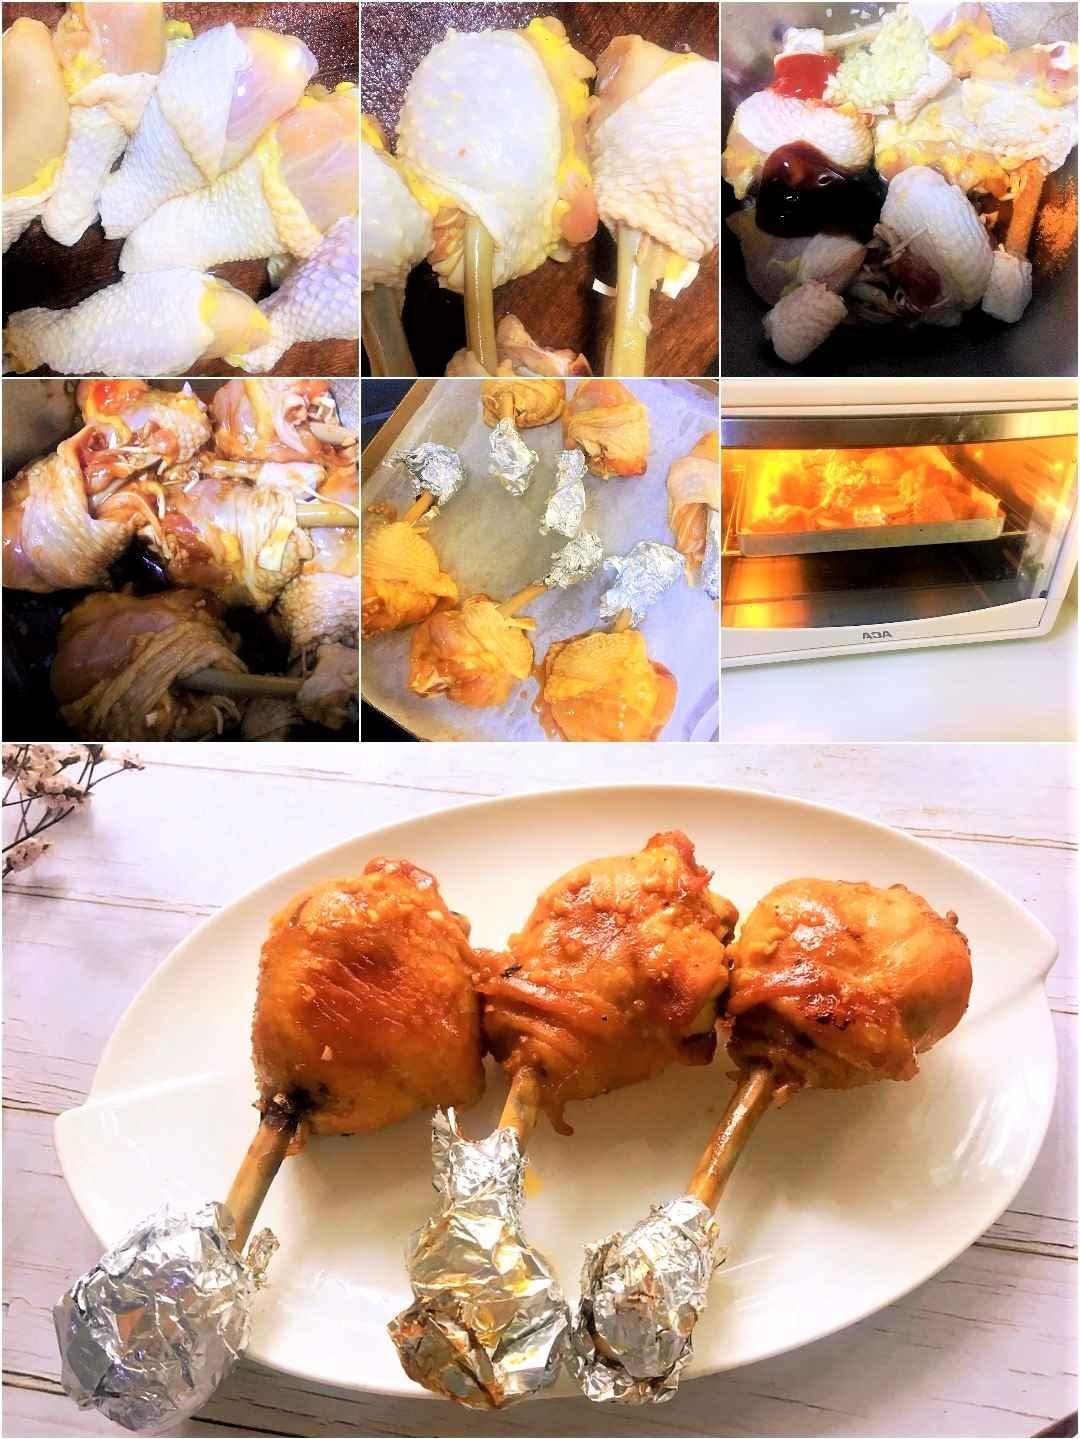 Baked chicken leg with honey baked honey chicken drumsticks steps